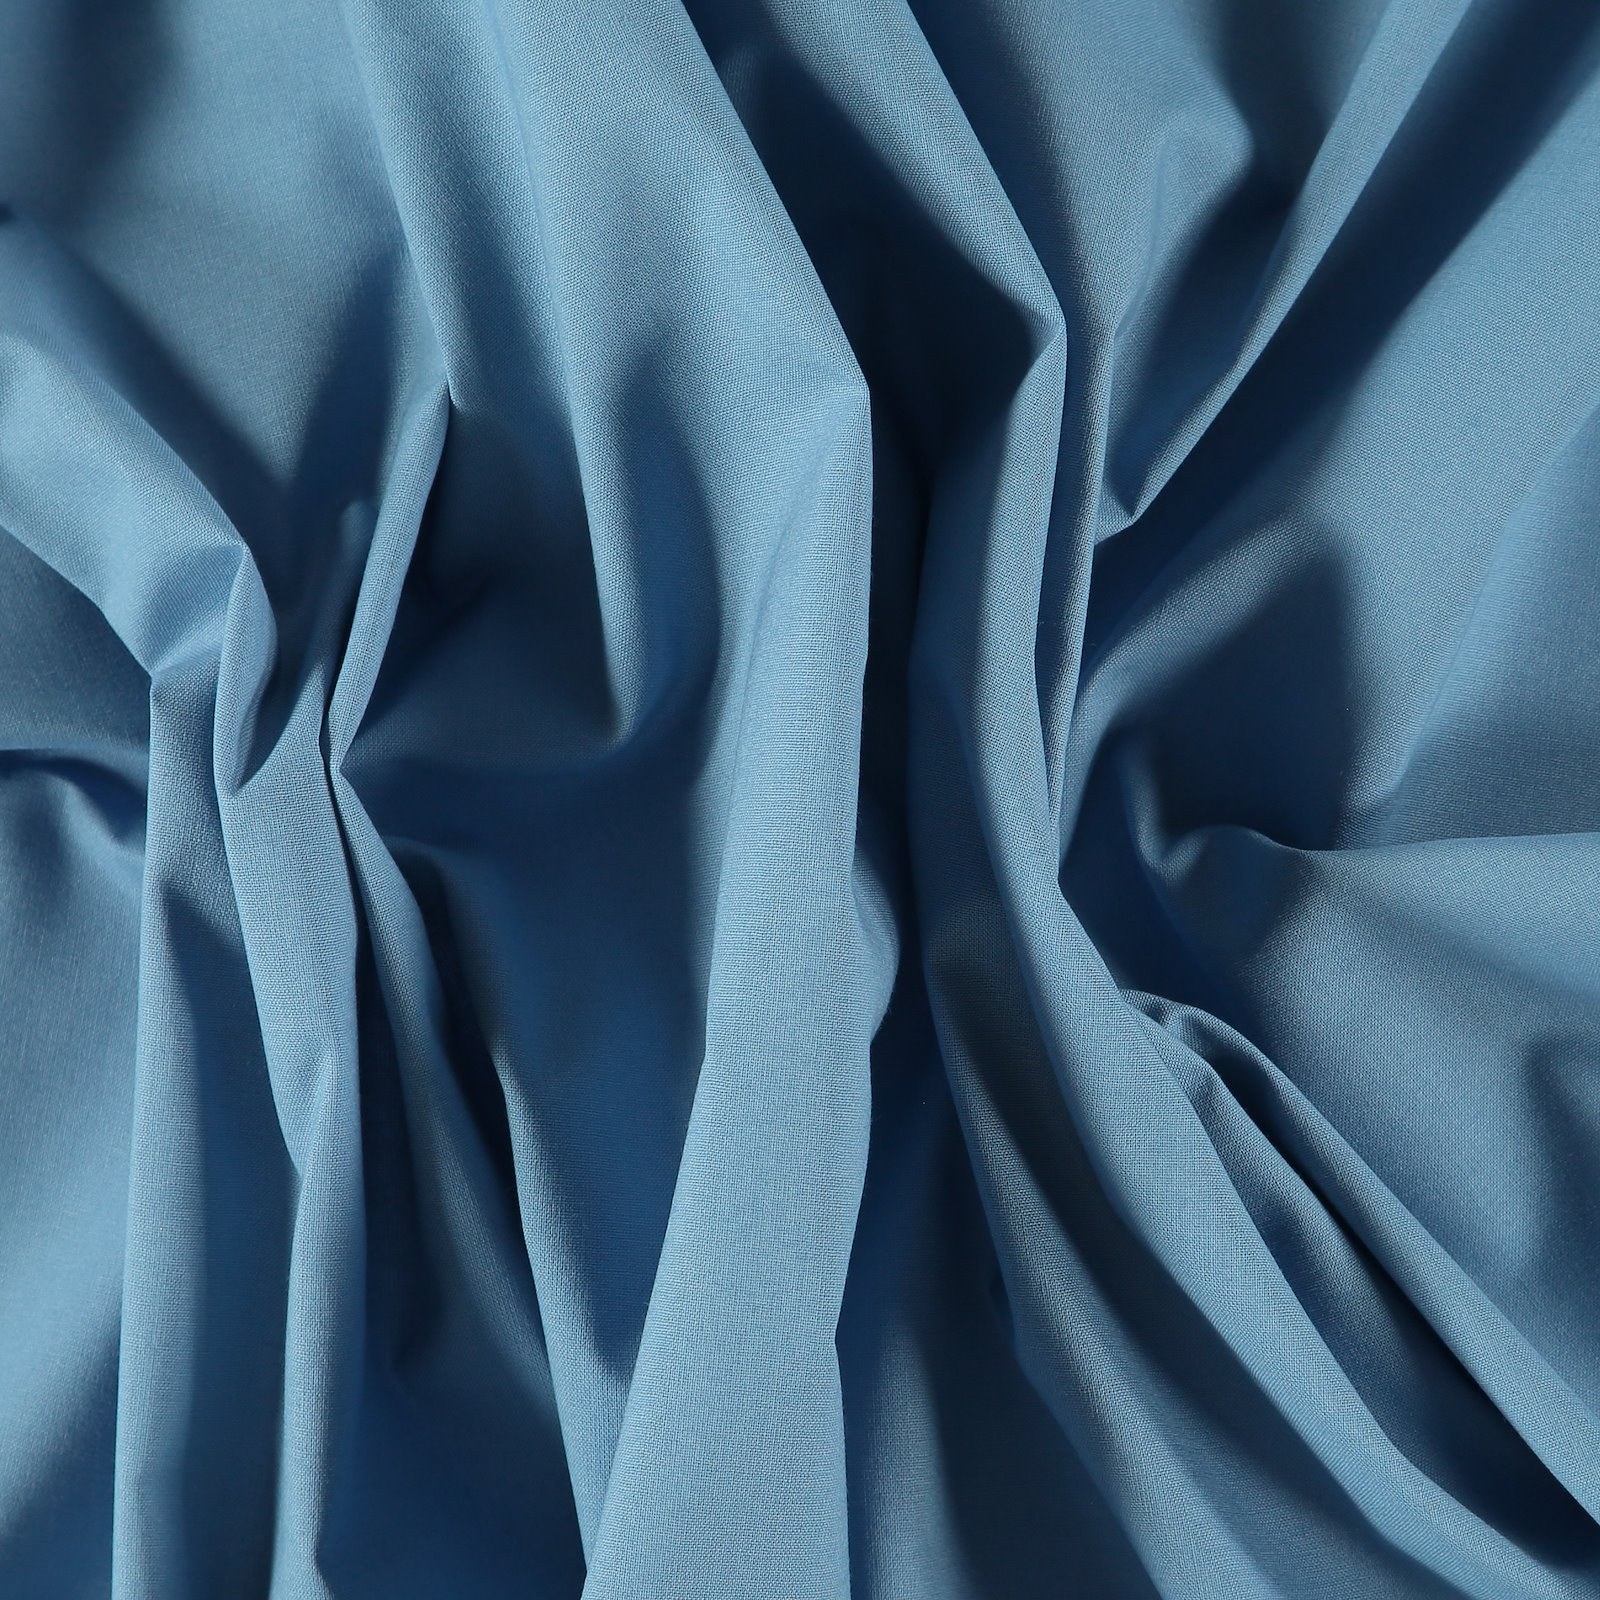 Luxury cotton light cobalt blue